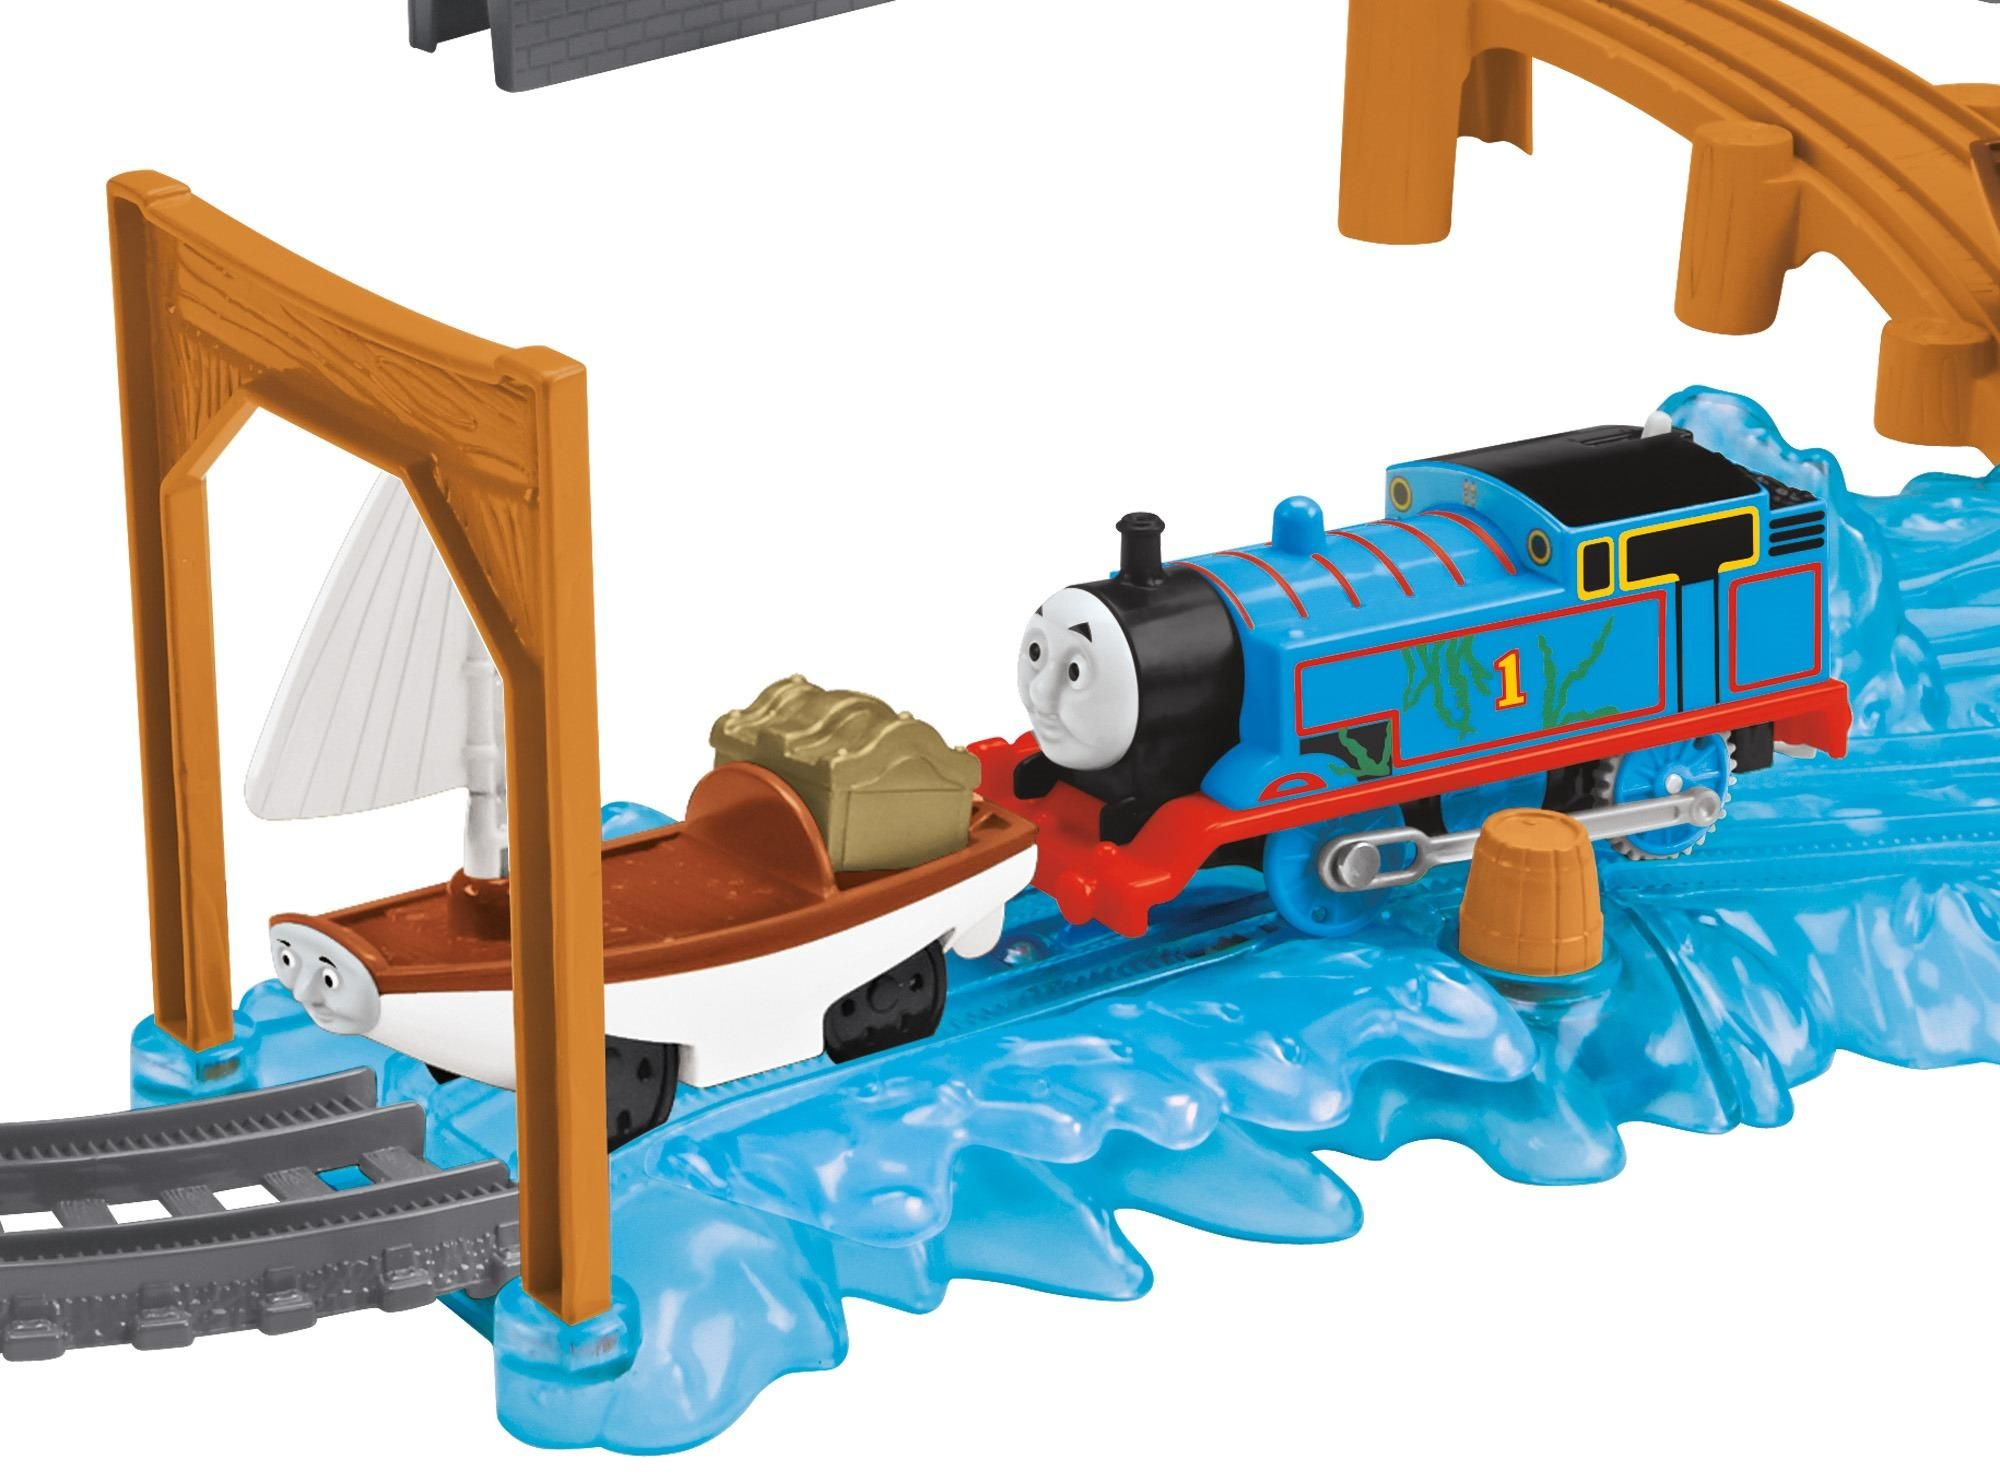 Fisher price thomas amp friends trackmaster treasure chase set new - Amazon Com Fisher Price Thomas The Train Trackmaster Treasure Chase Set Toys